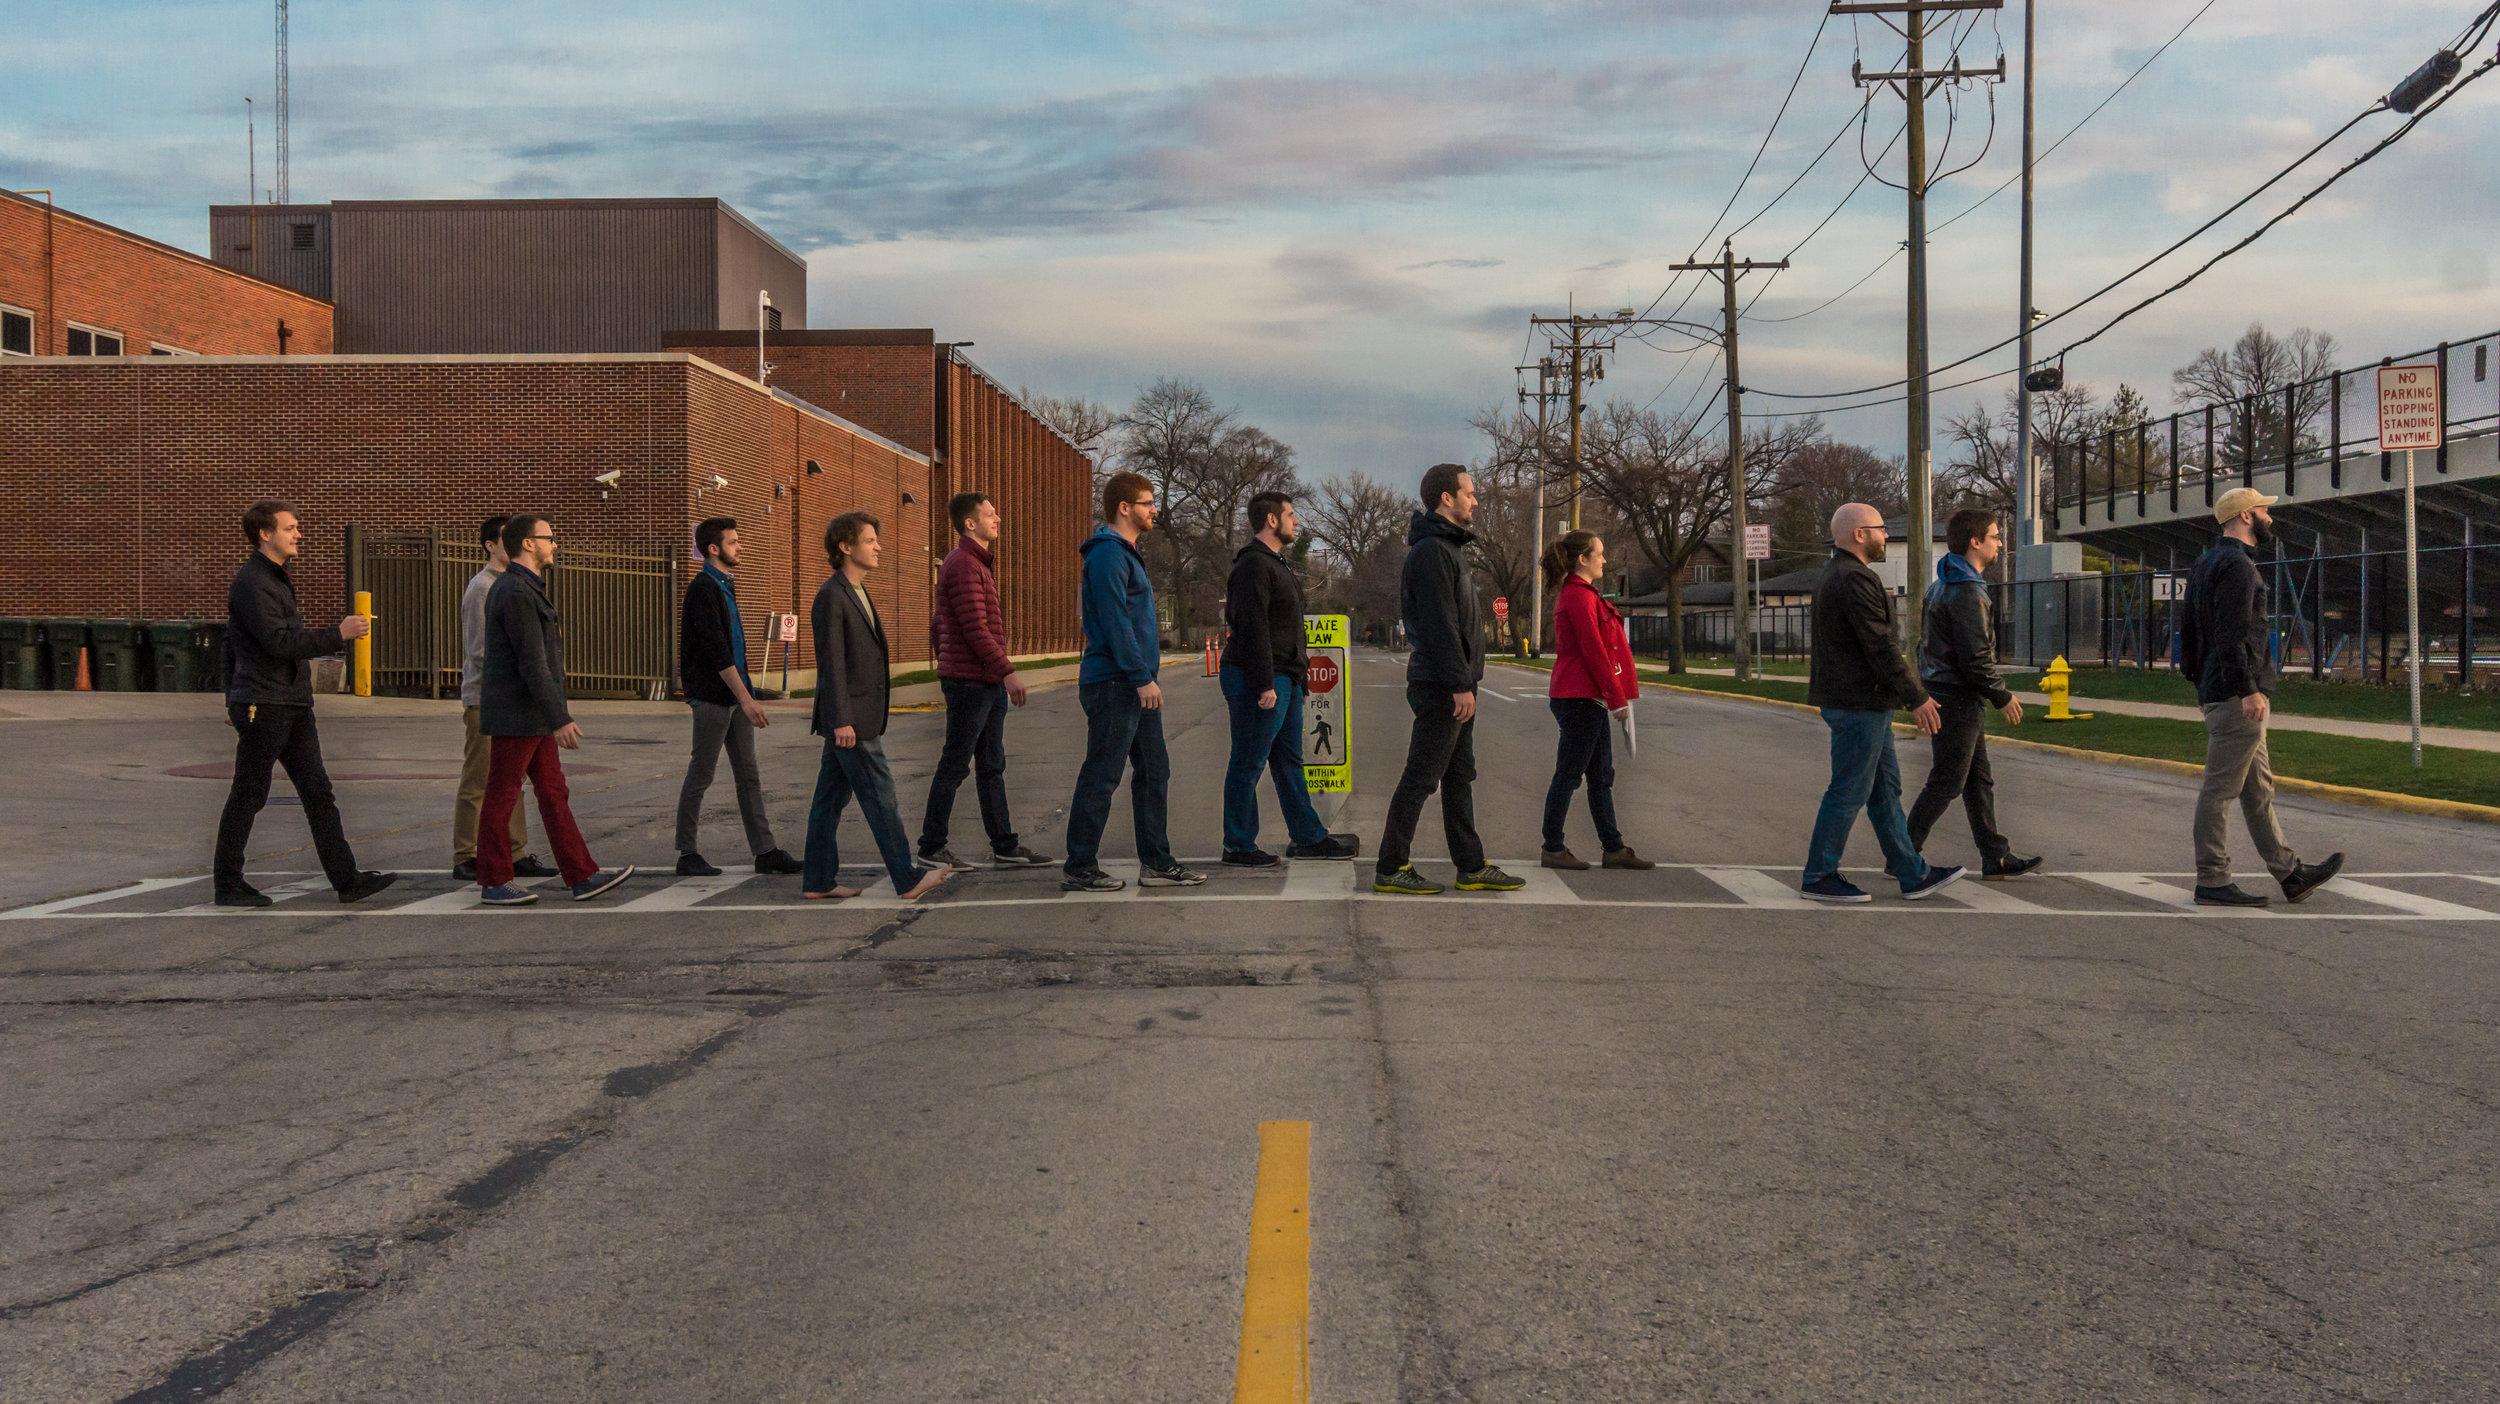 Members of the Heisenberg Uncertainty Players walking across a street (like Abbey Road)